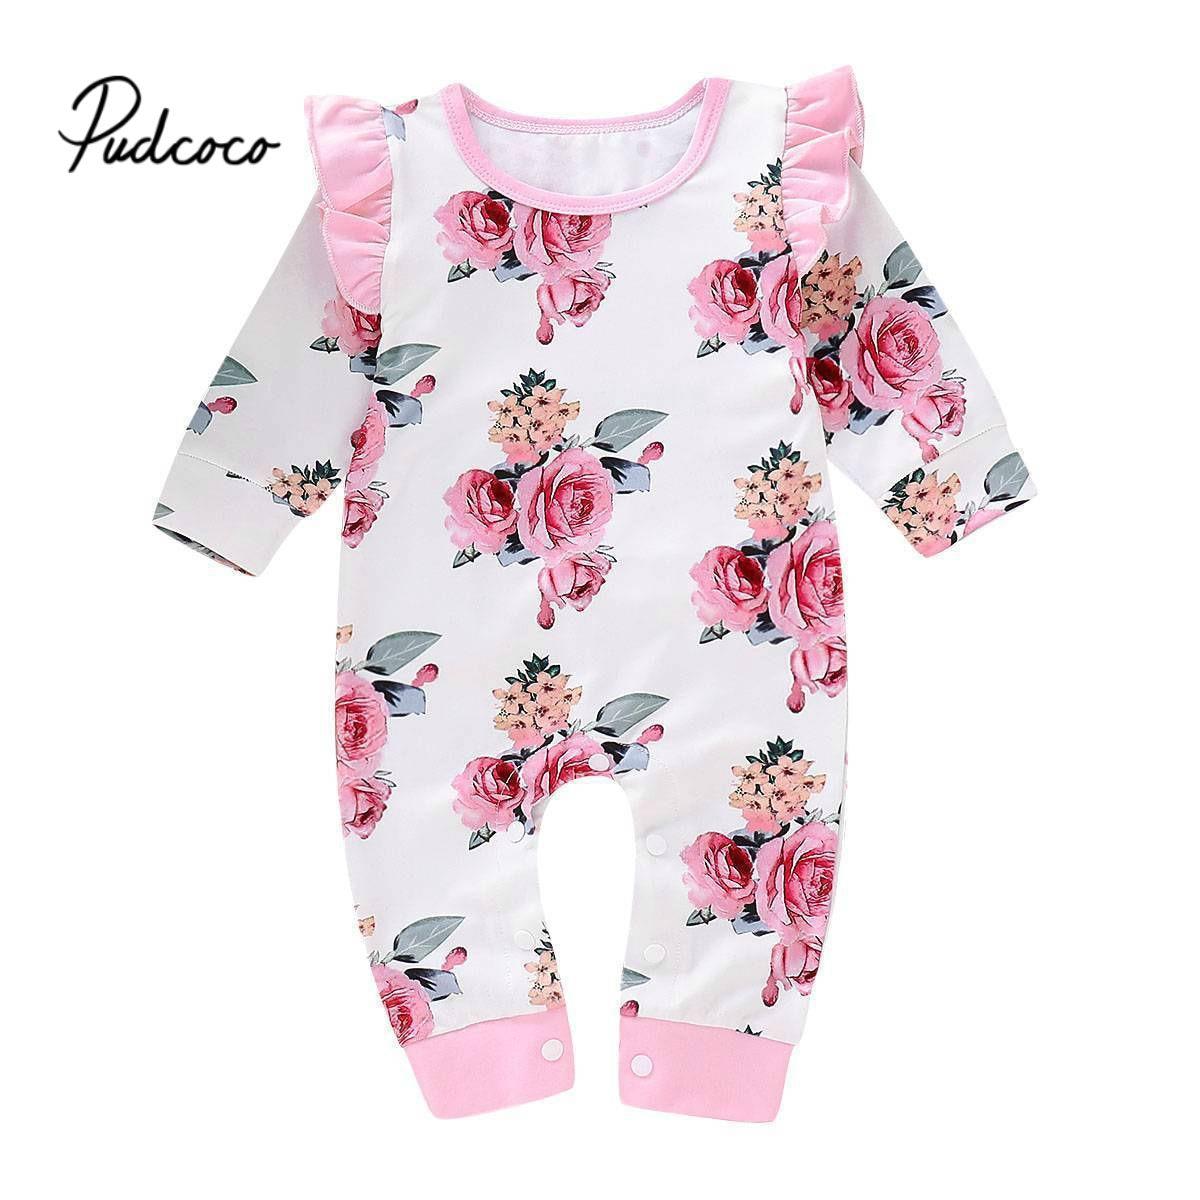 Mamelucos de invierno para niña, ropa de moda para primavera para recién nacidos para niñas, mono de manga larga para niños y niñas, conjuntos de Ropa para Niñas